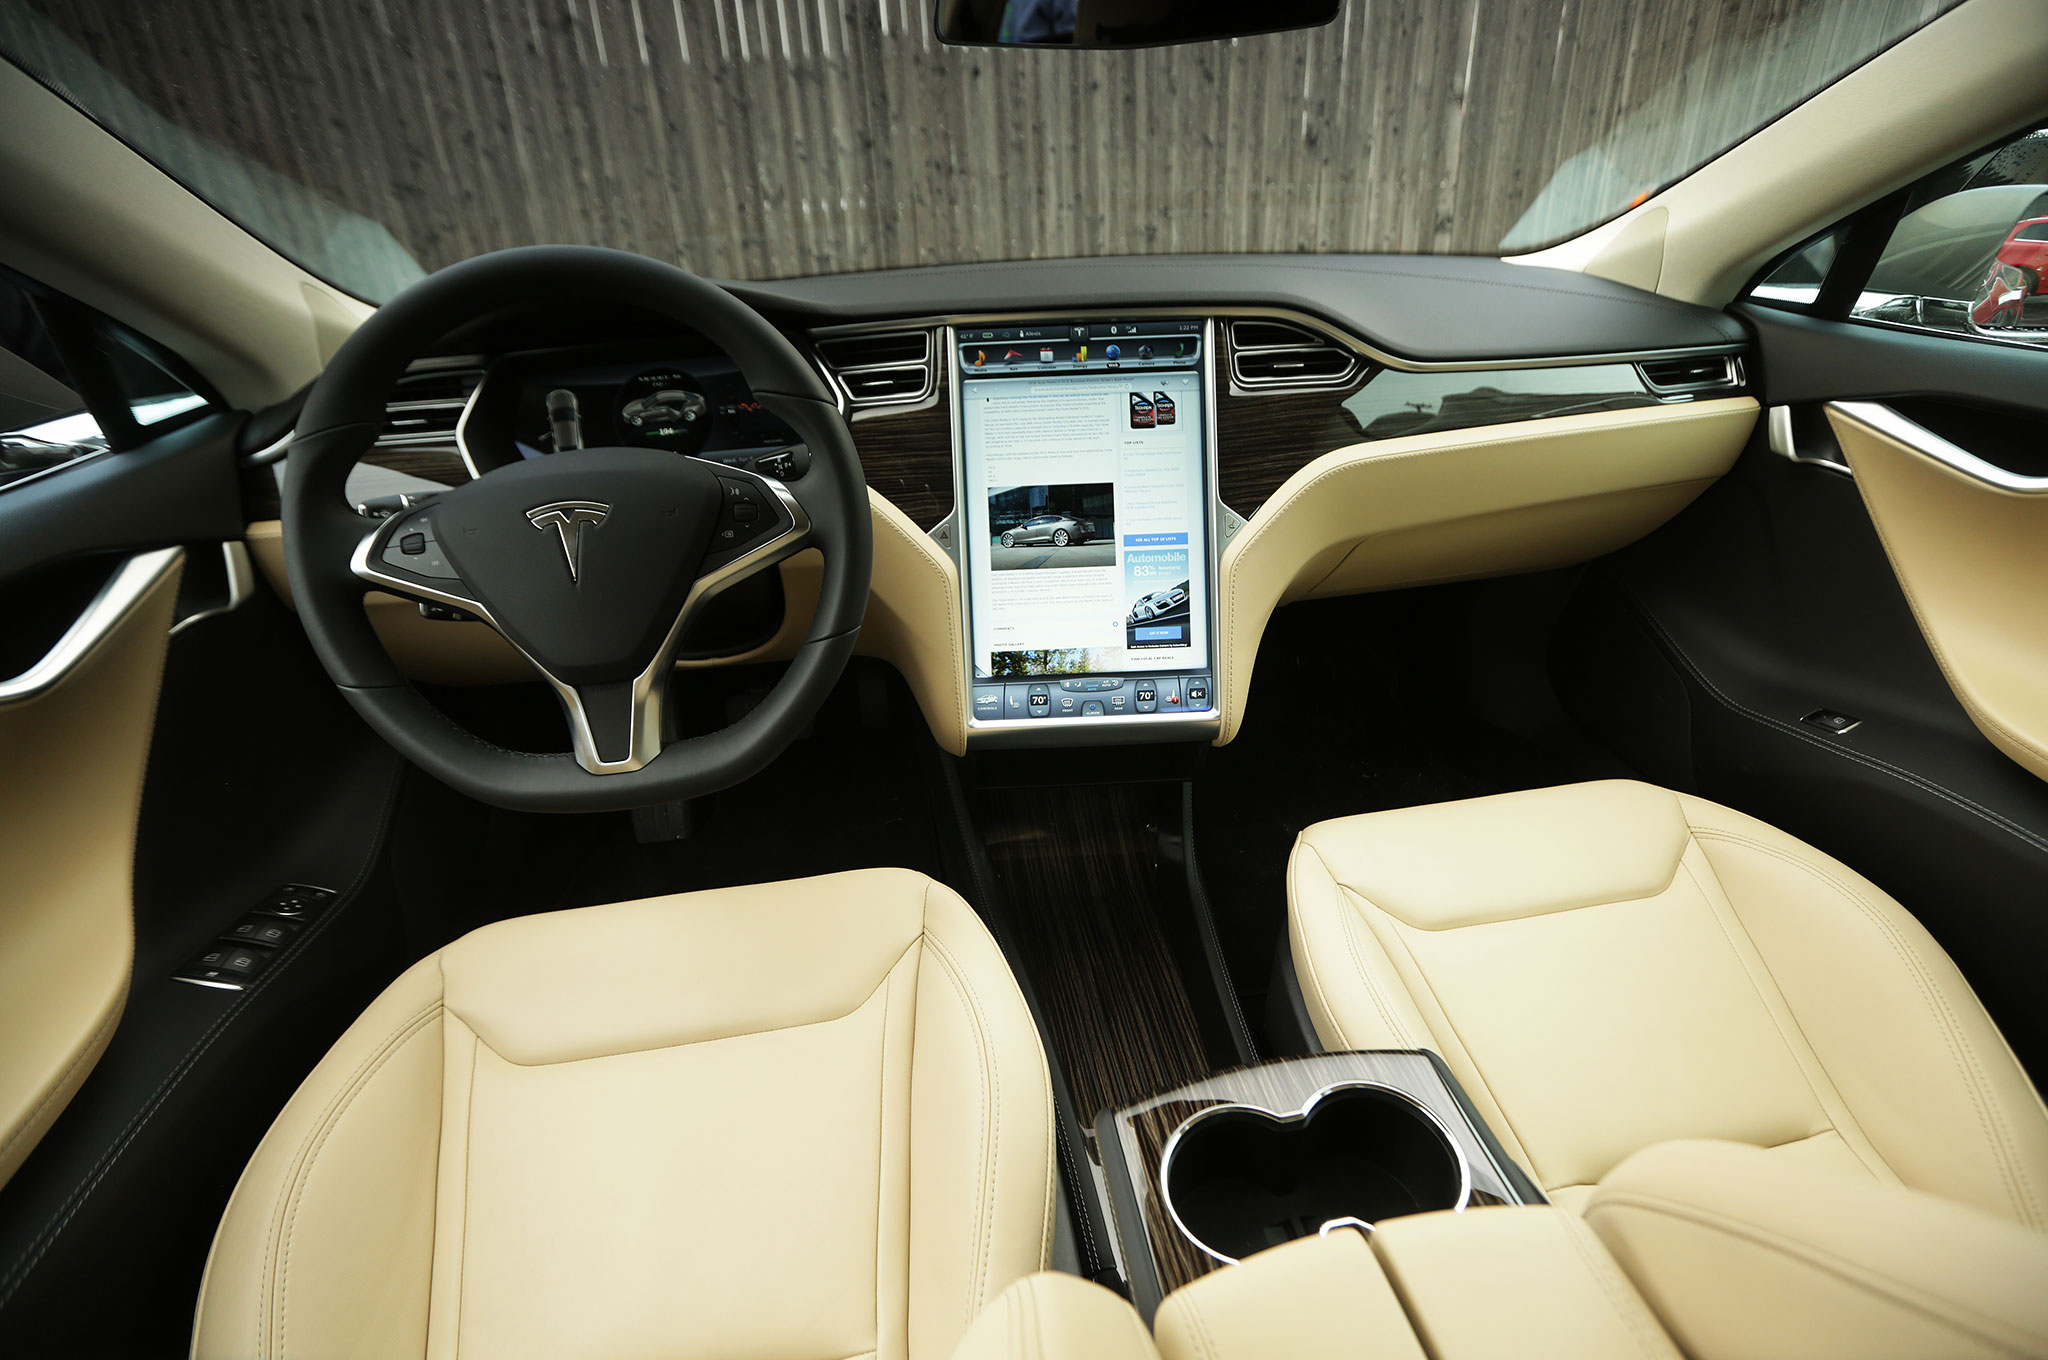 Tesla model s the jaguar e type of our time for Interieur tesla